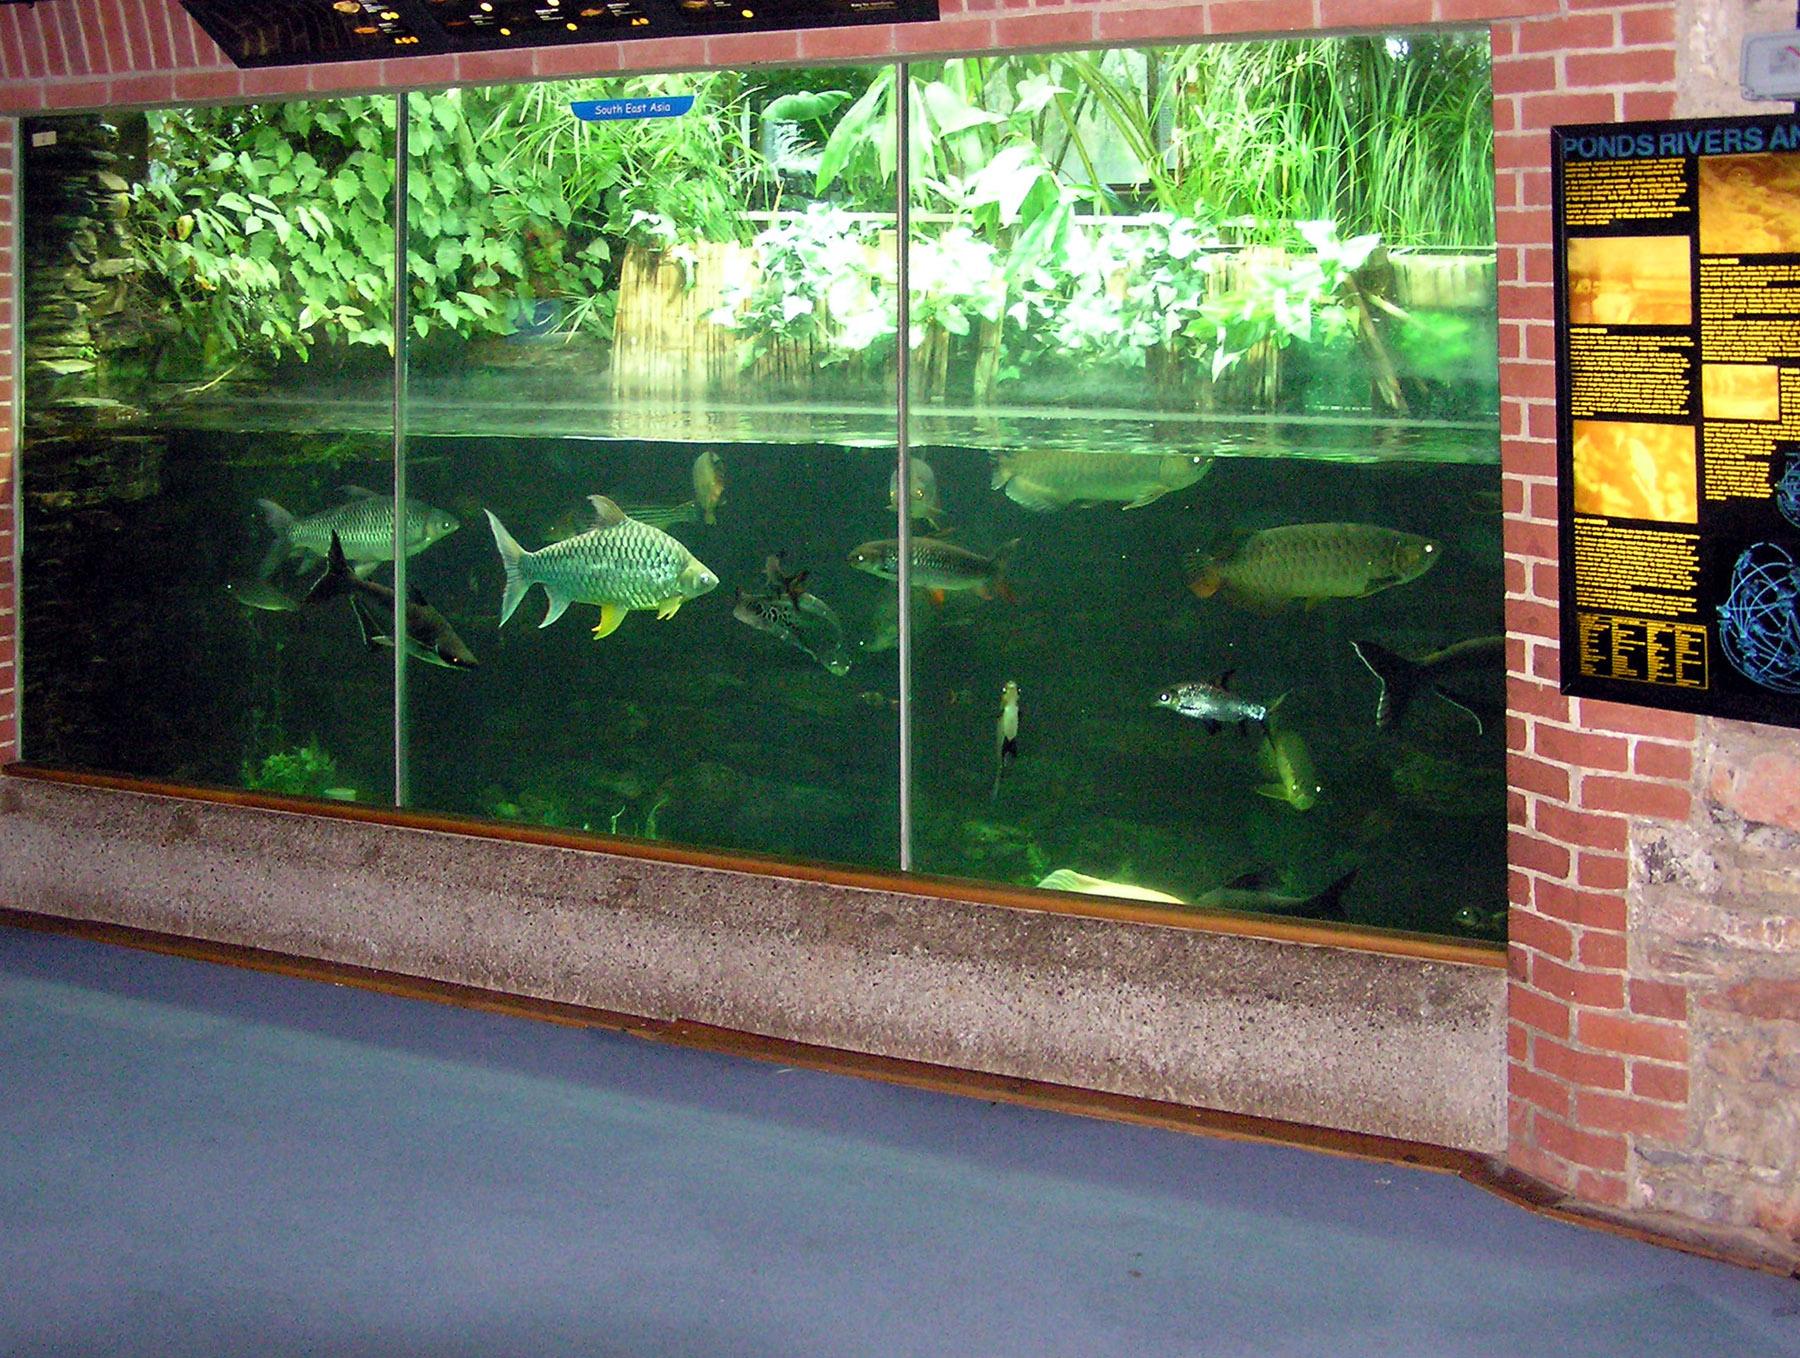 Fish aquarium zoo exploring omaha scott aquarium henry for Asian fish tank decorations